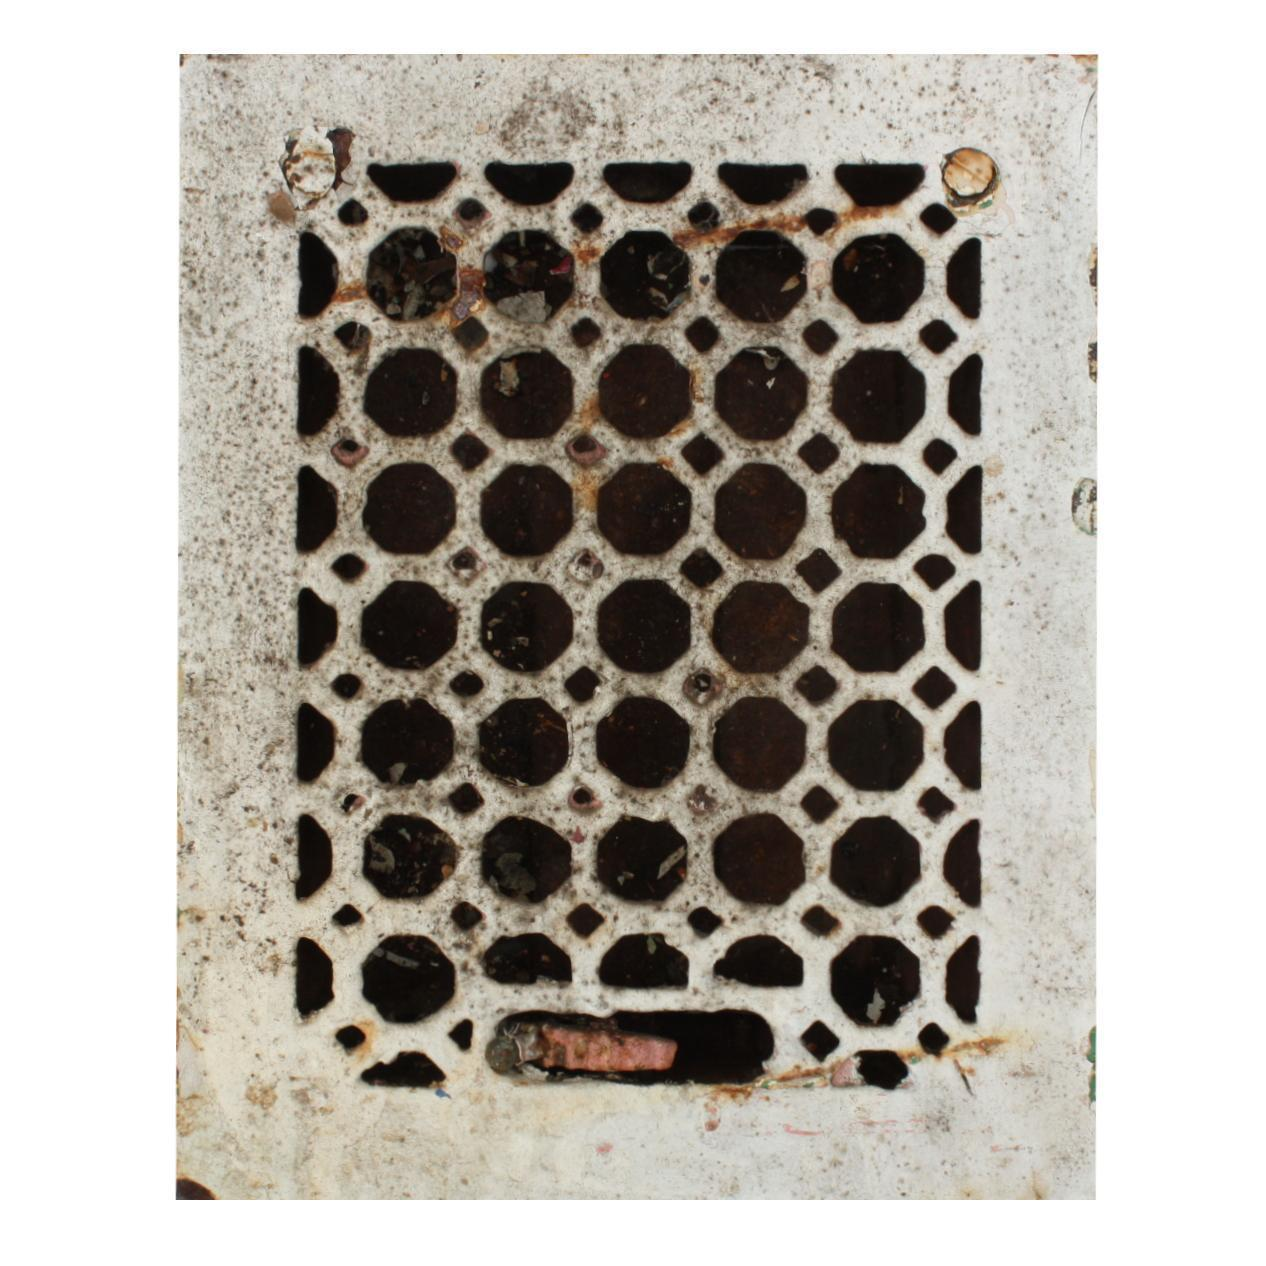 Antique Cast Iron Heat Register, Honeycomb Pattern